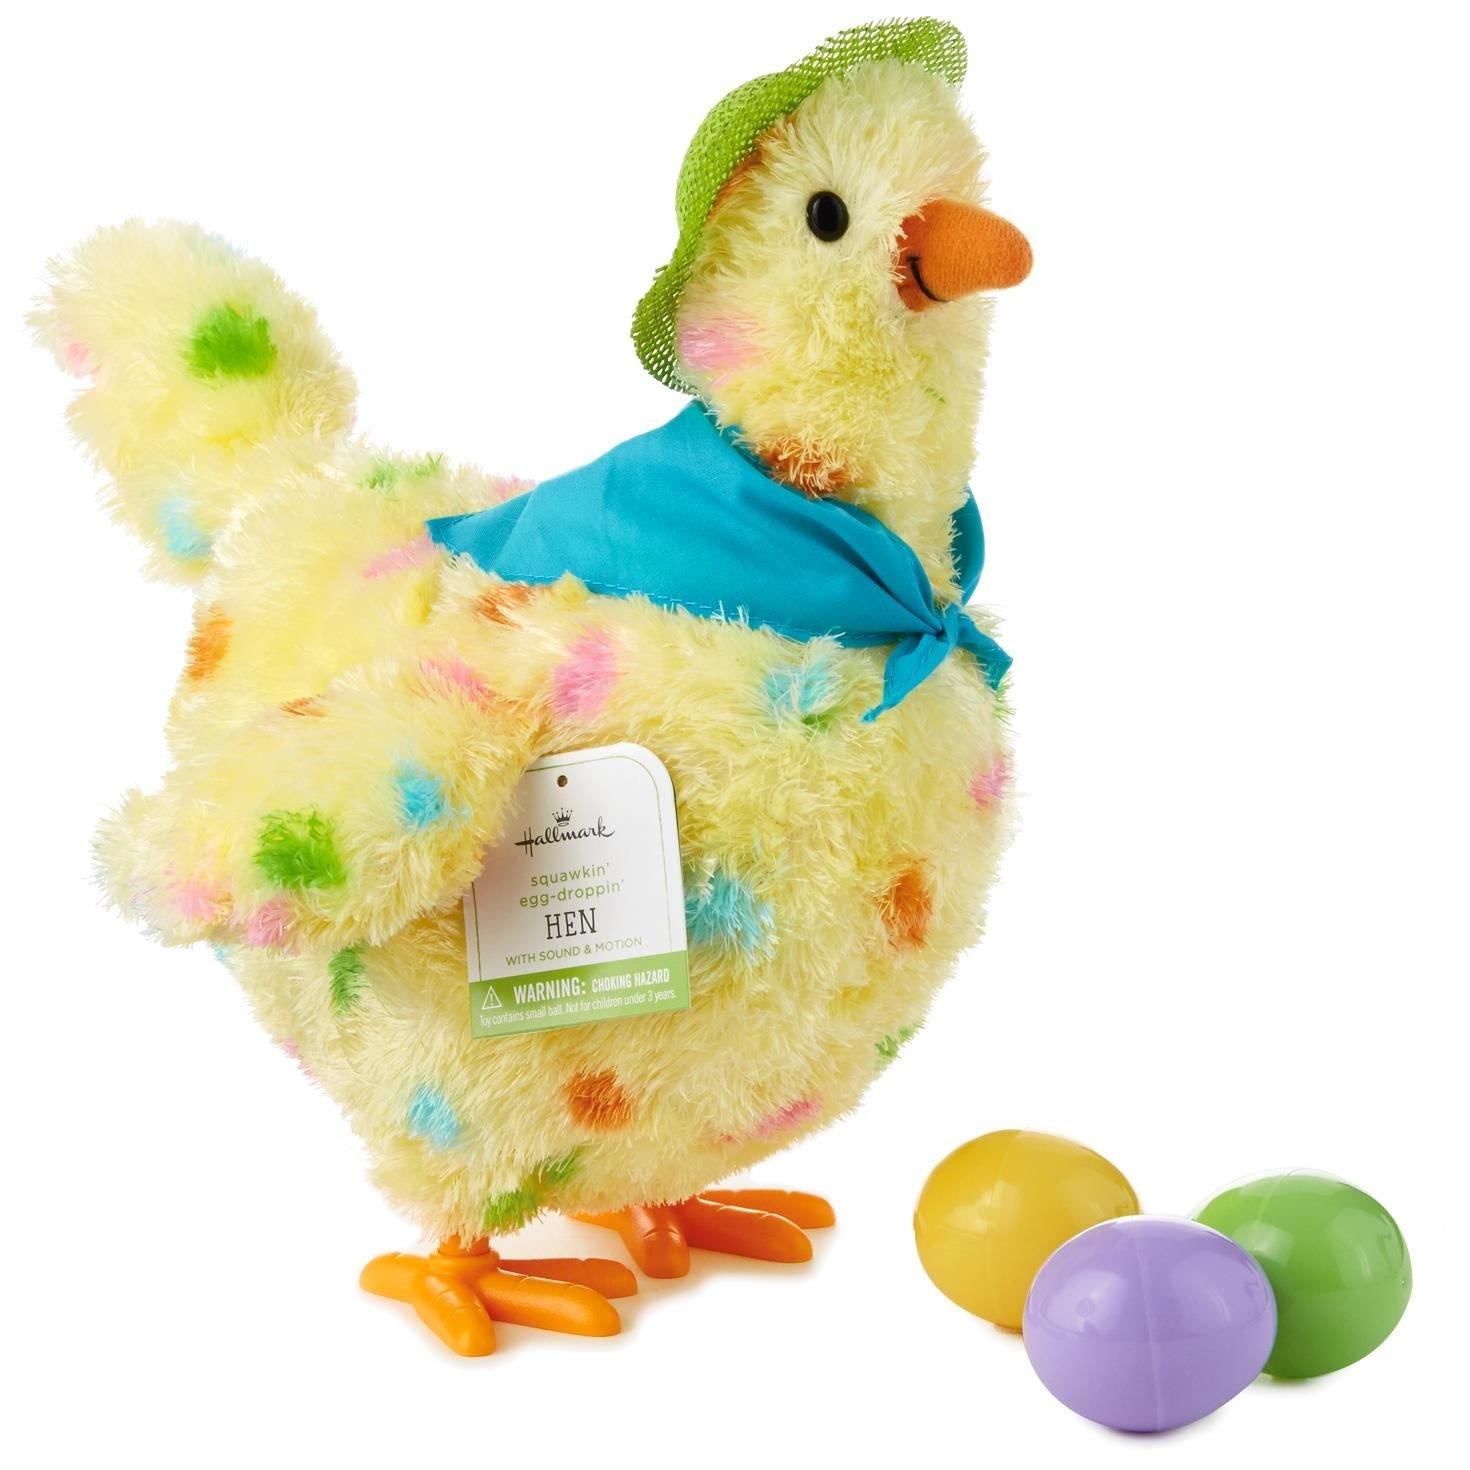 amazon com hallmark squawkin u0027 egg droppin u0027 mama hen 10 inch